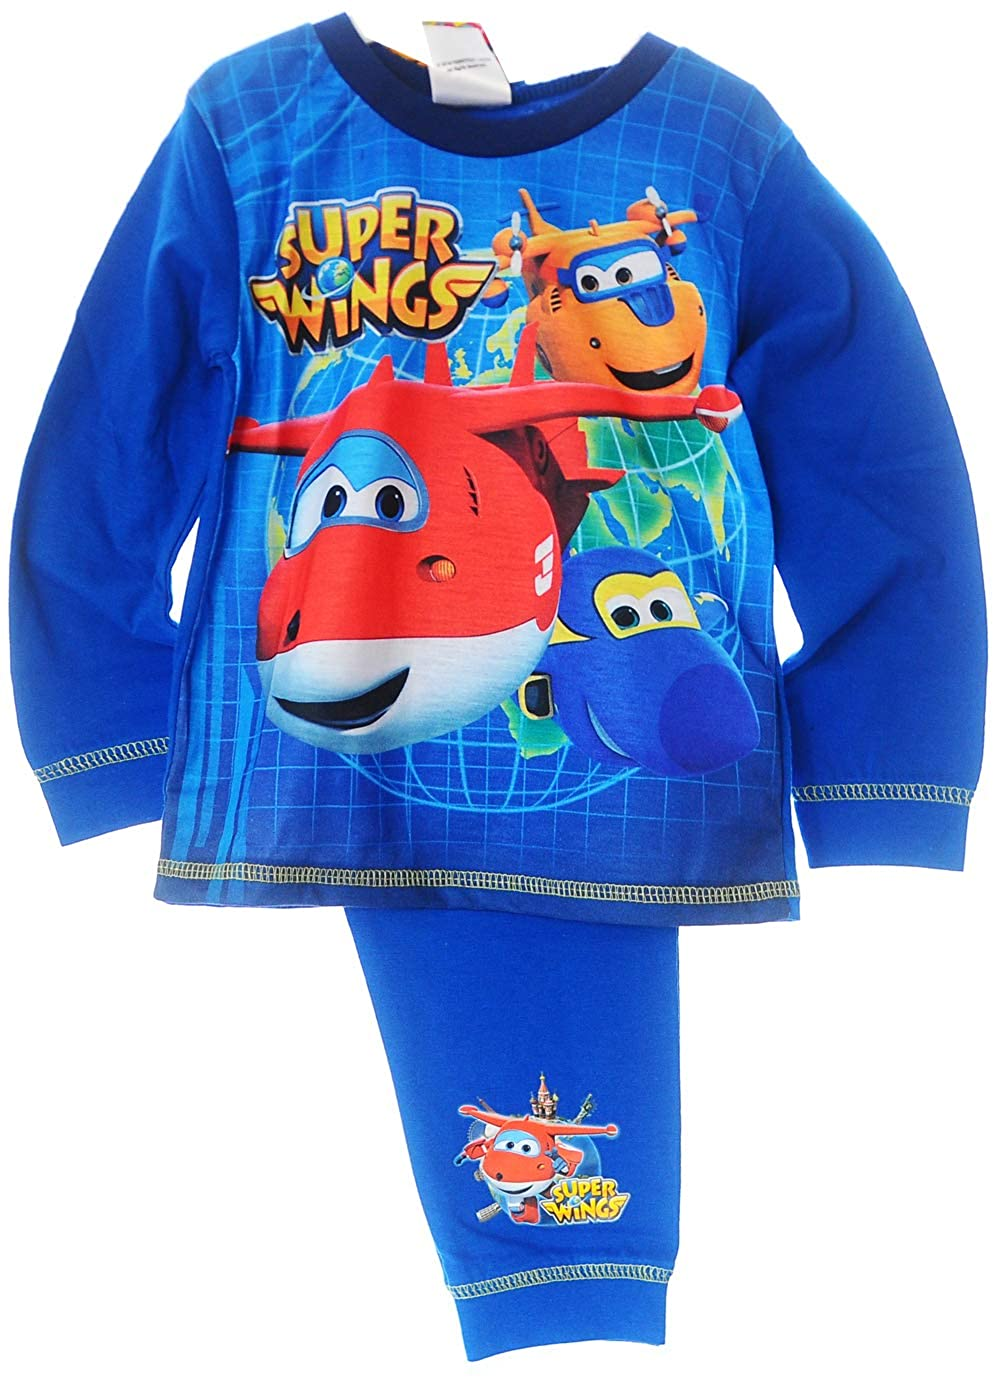 Pyjama Flieger Schlafanzug SET 80 86 92 98 104 110 Shirt Hose Super Wings Planes